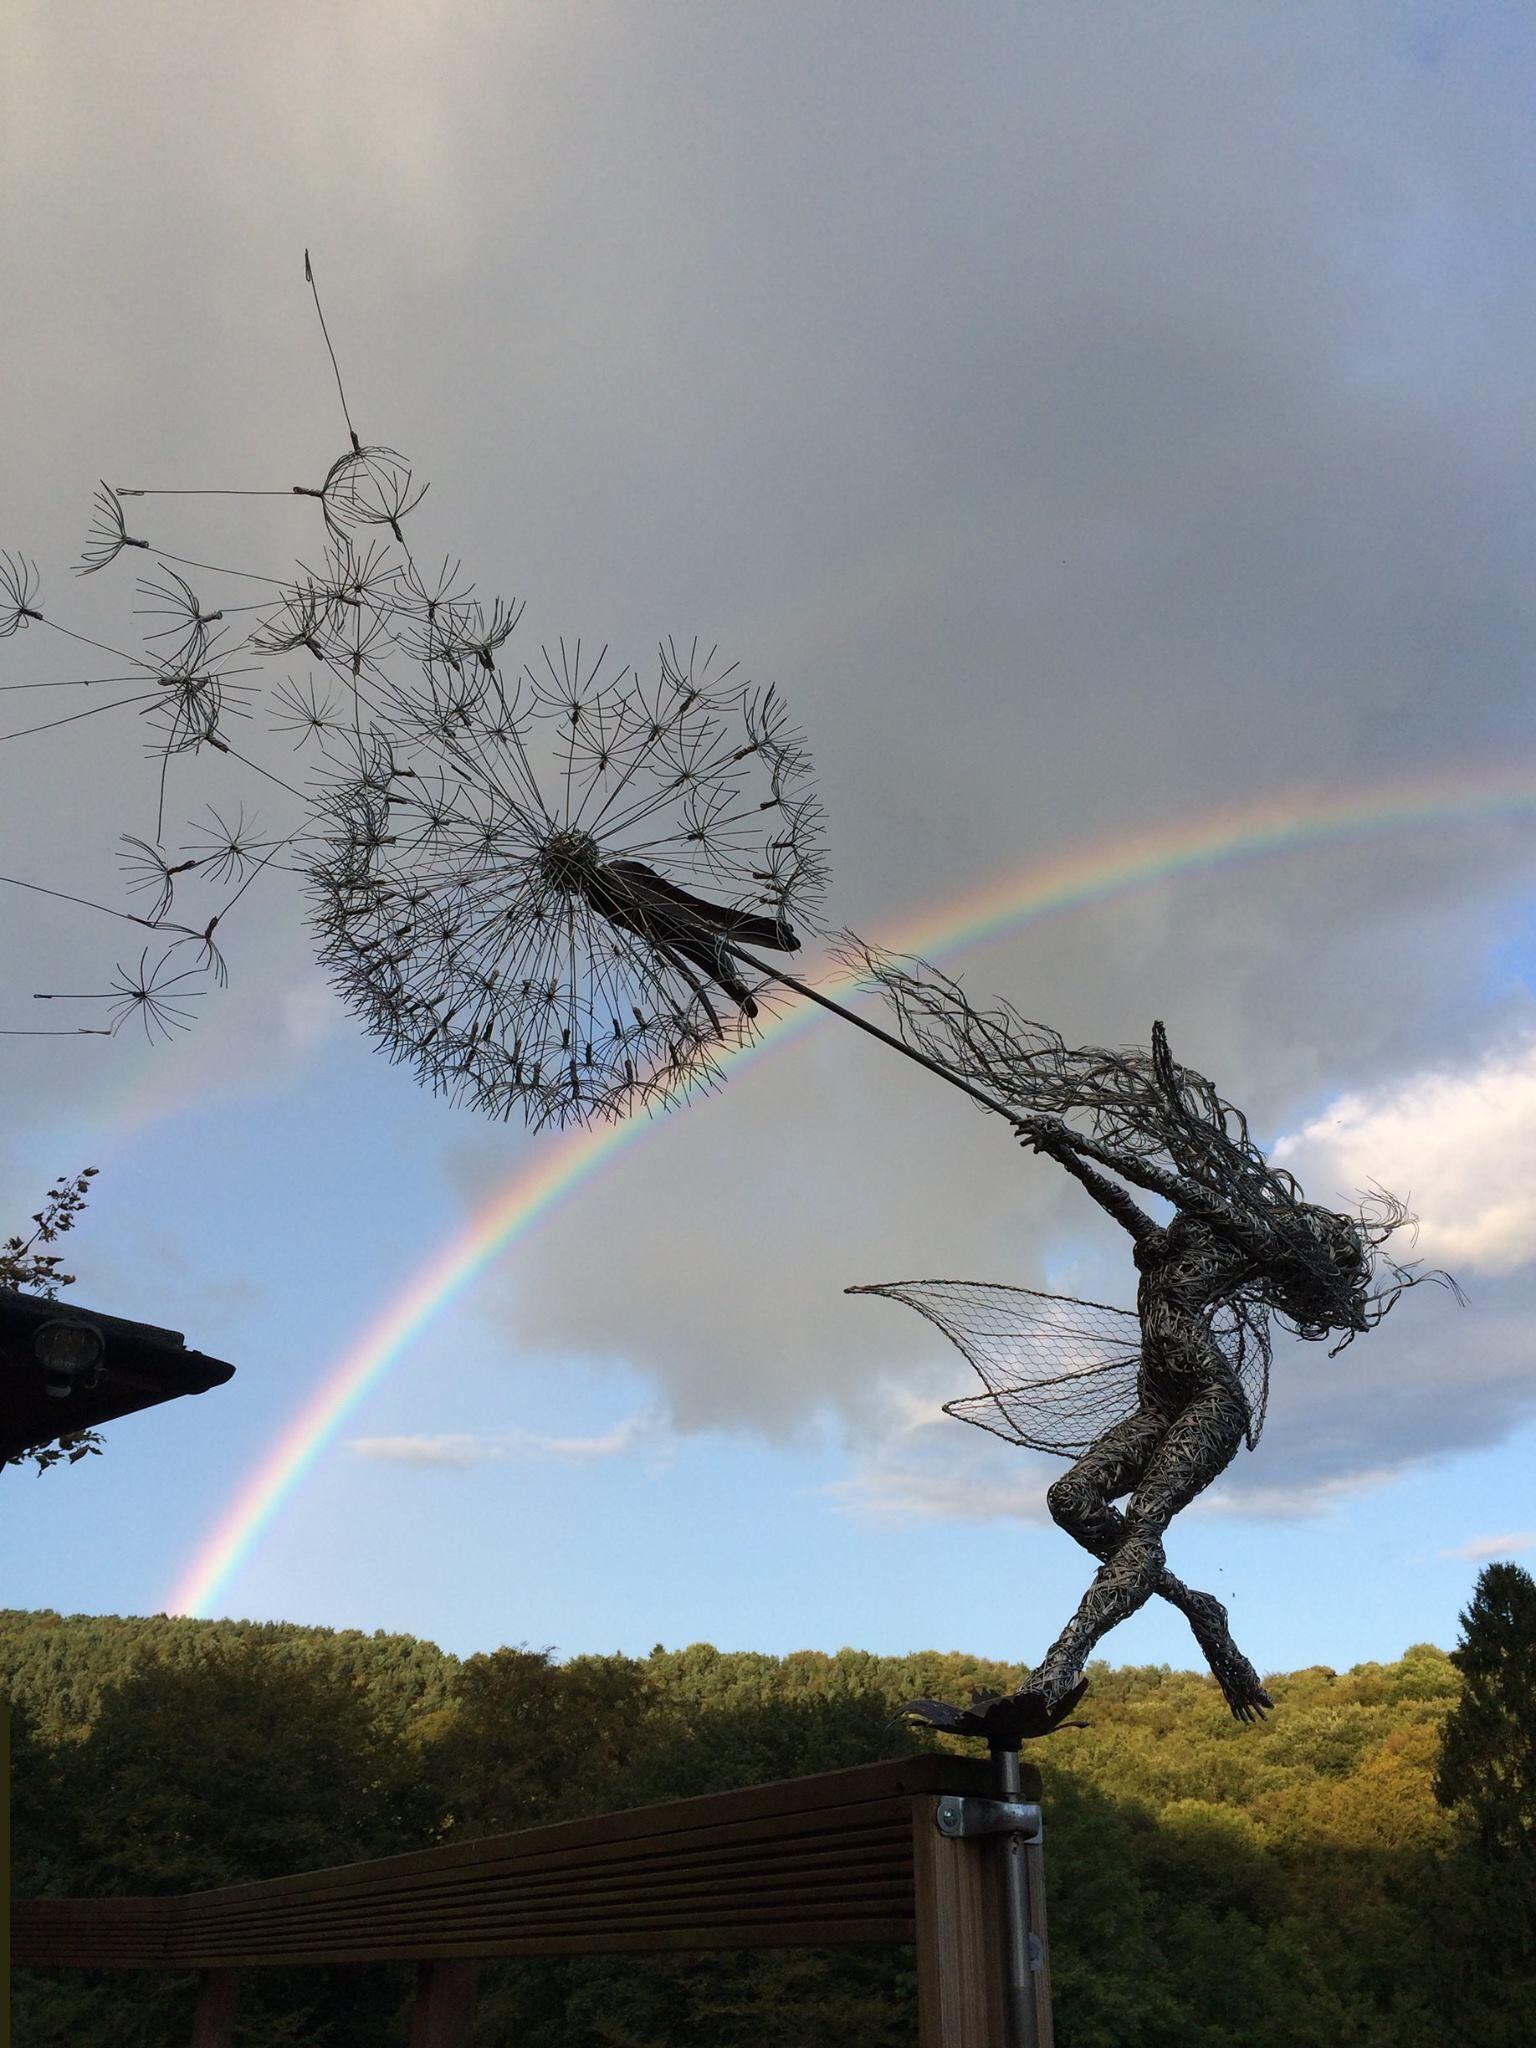 Wire Fairy Dandelion Sculpture Center Circuit Dvds Kevinchantcom Statue Fairies And Garden Magic Pinterest Statues Rh Ca Large Nebraska